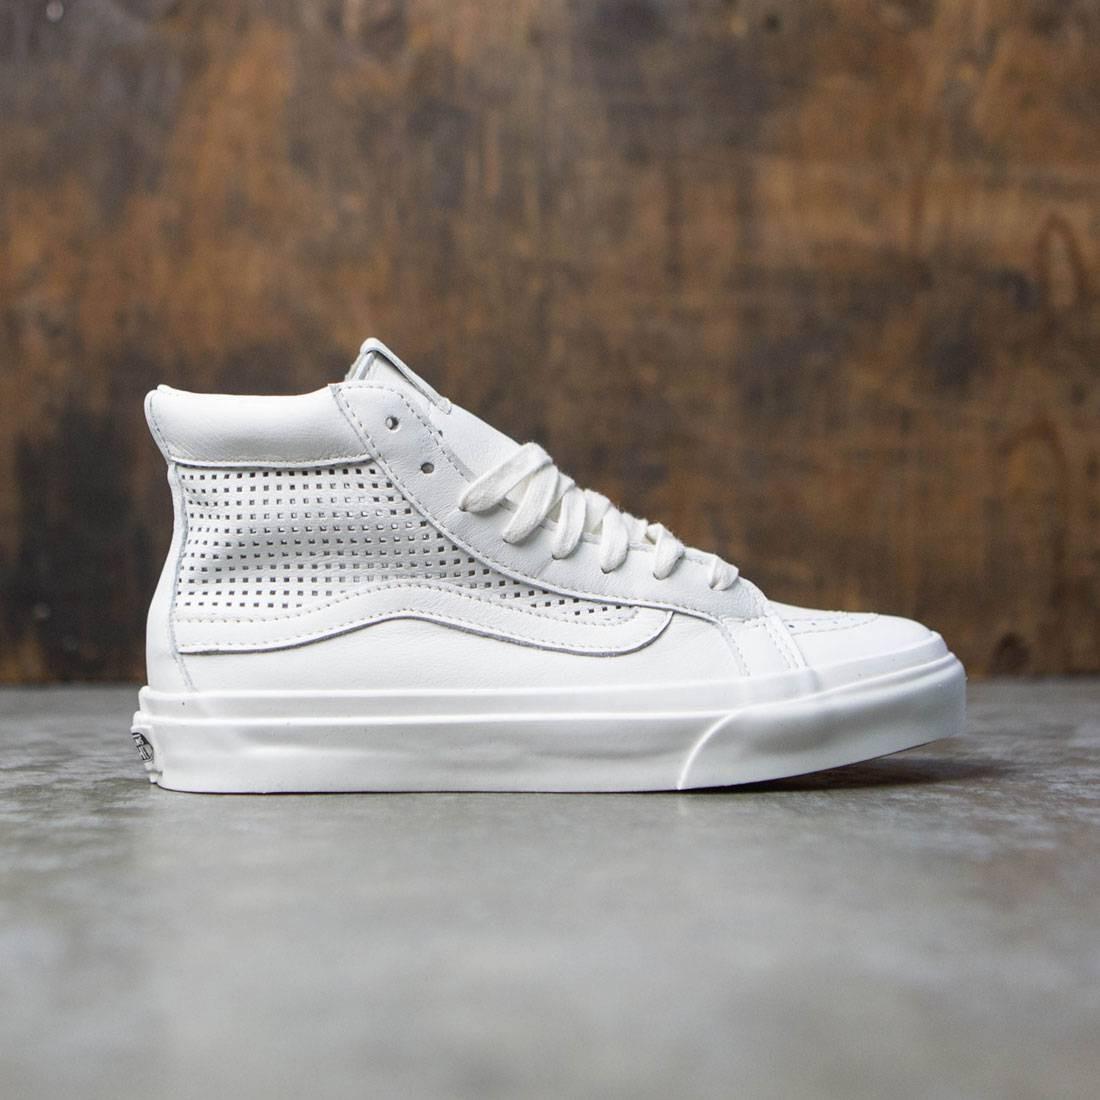 a9439f171ebf Vans Women Sk8-Hi Slim Cutout DX - Square white blanc de blanc